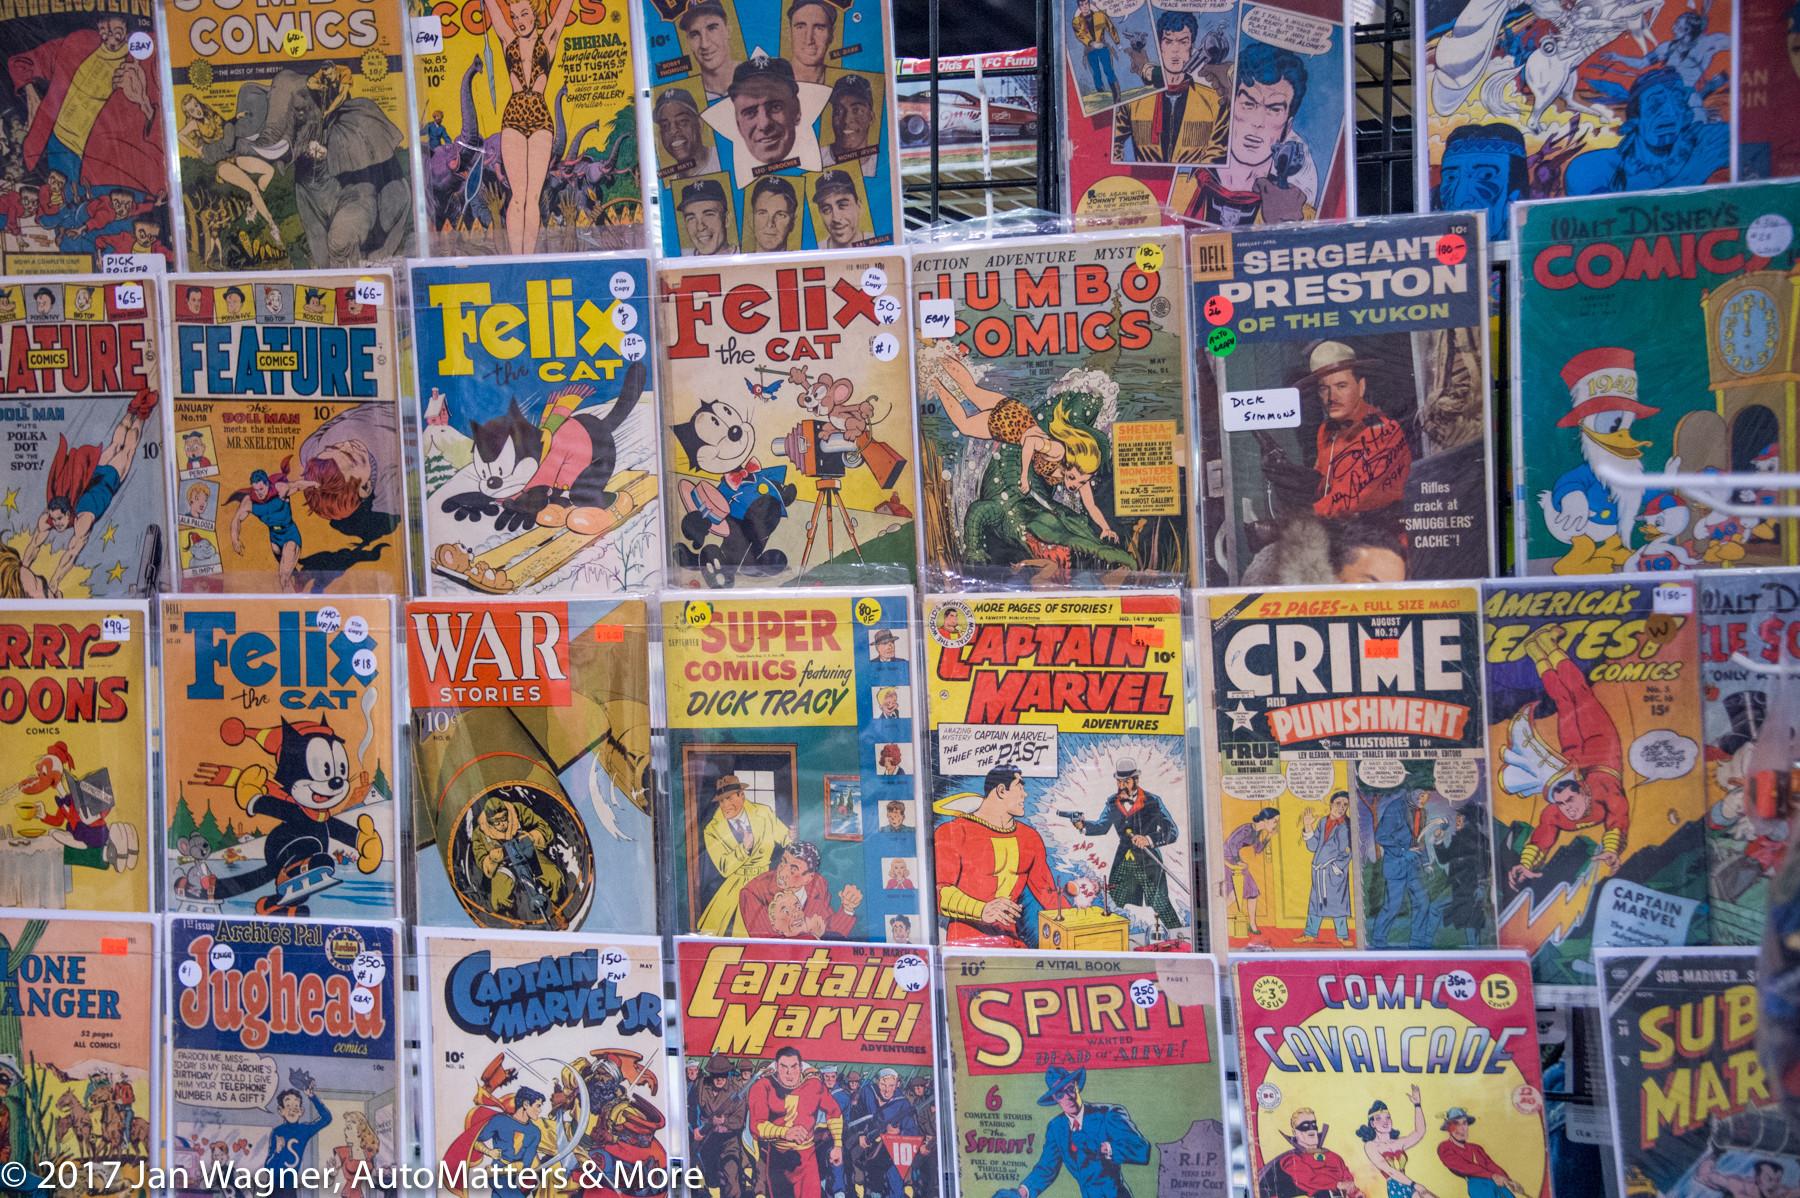 Comic books at WonderCon